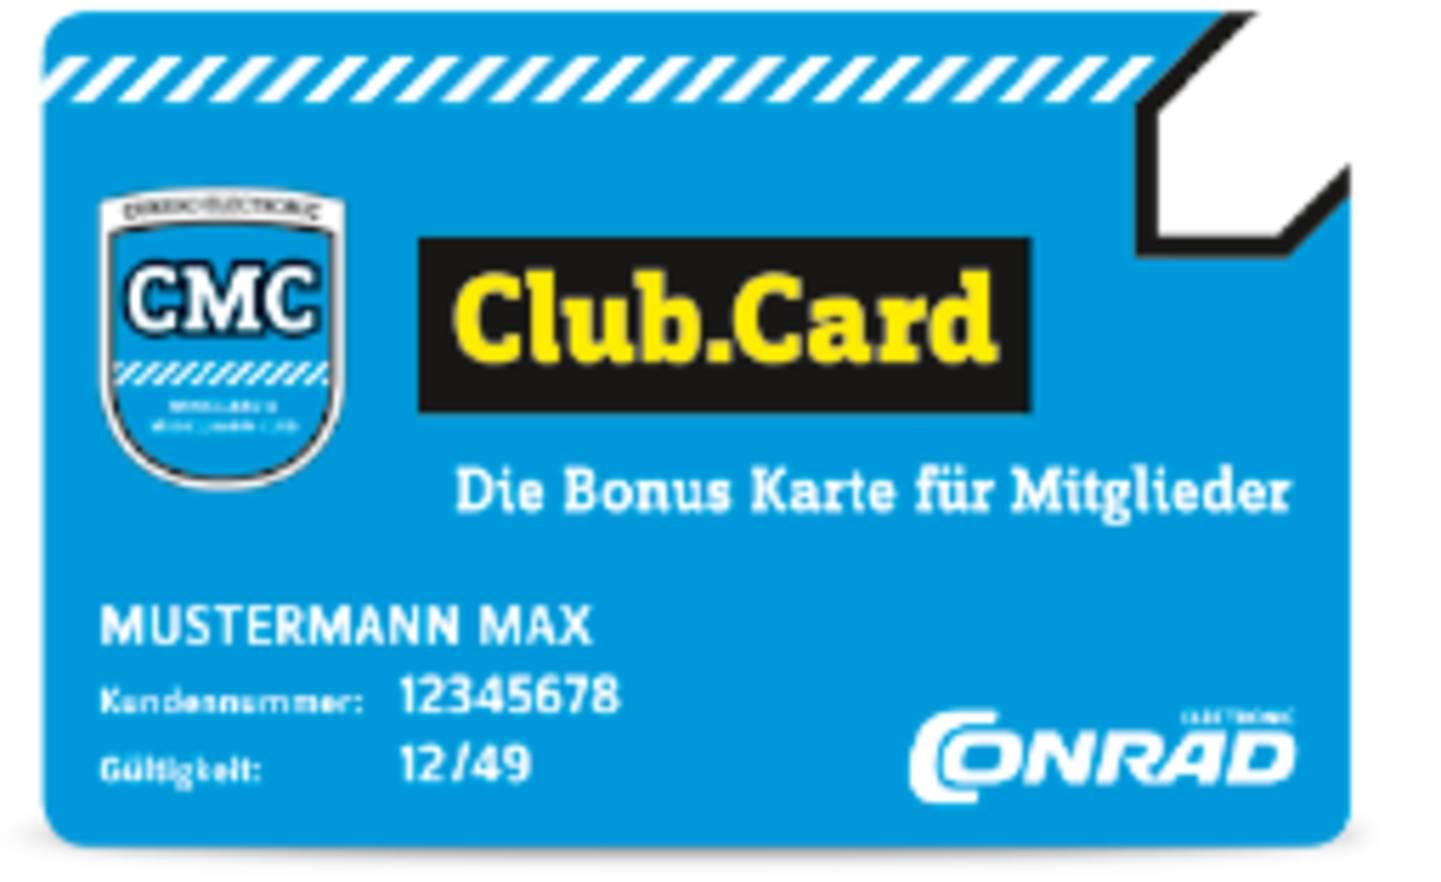 Club.Card mit Zahlungsfunktion